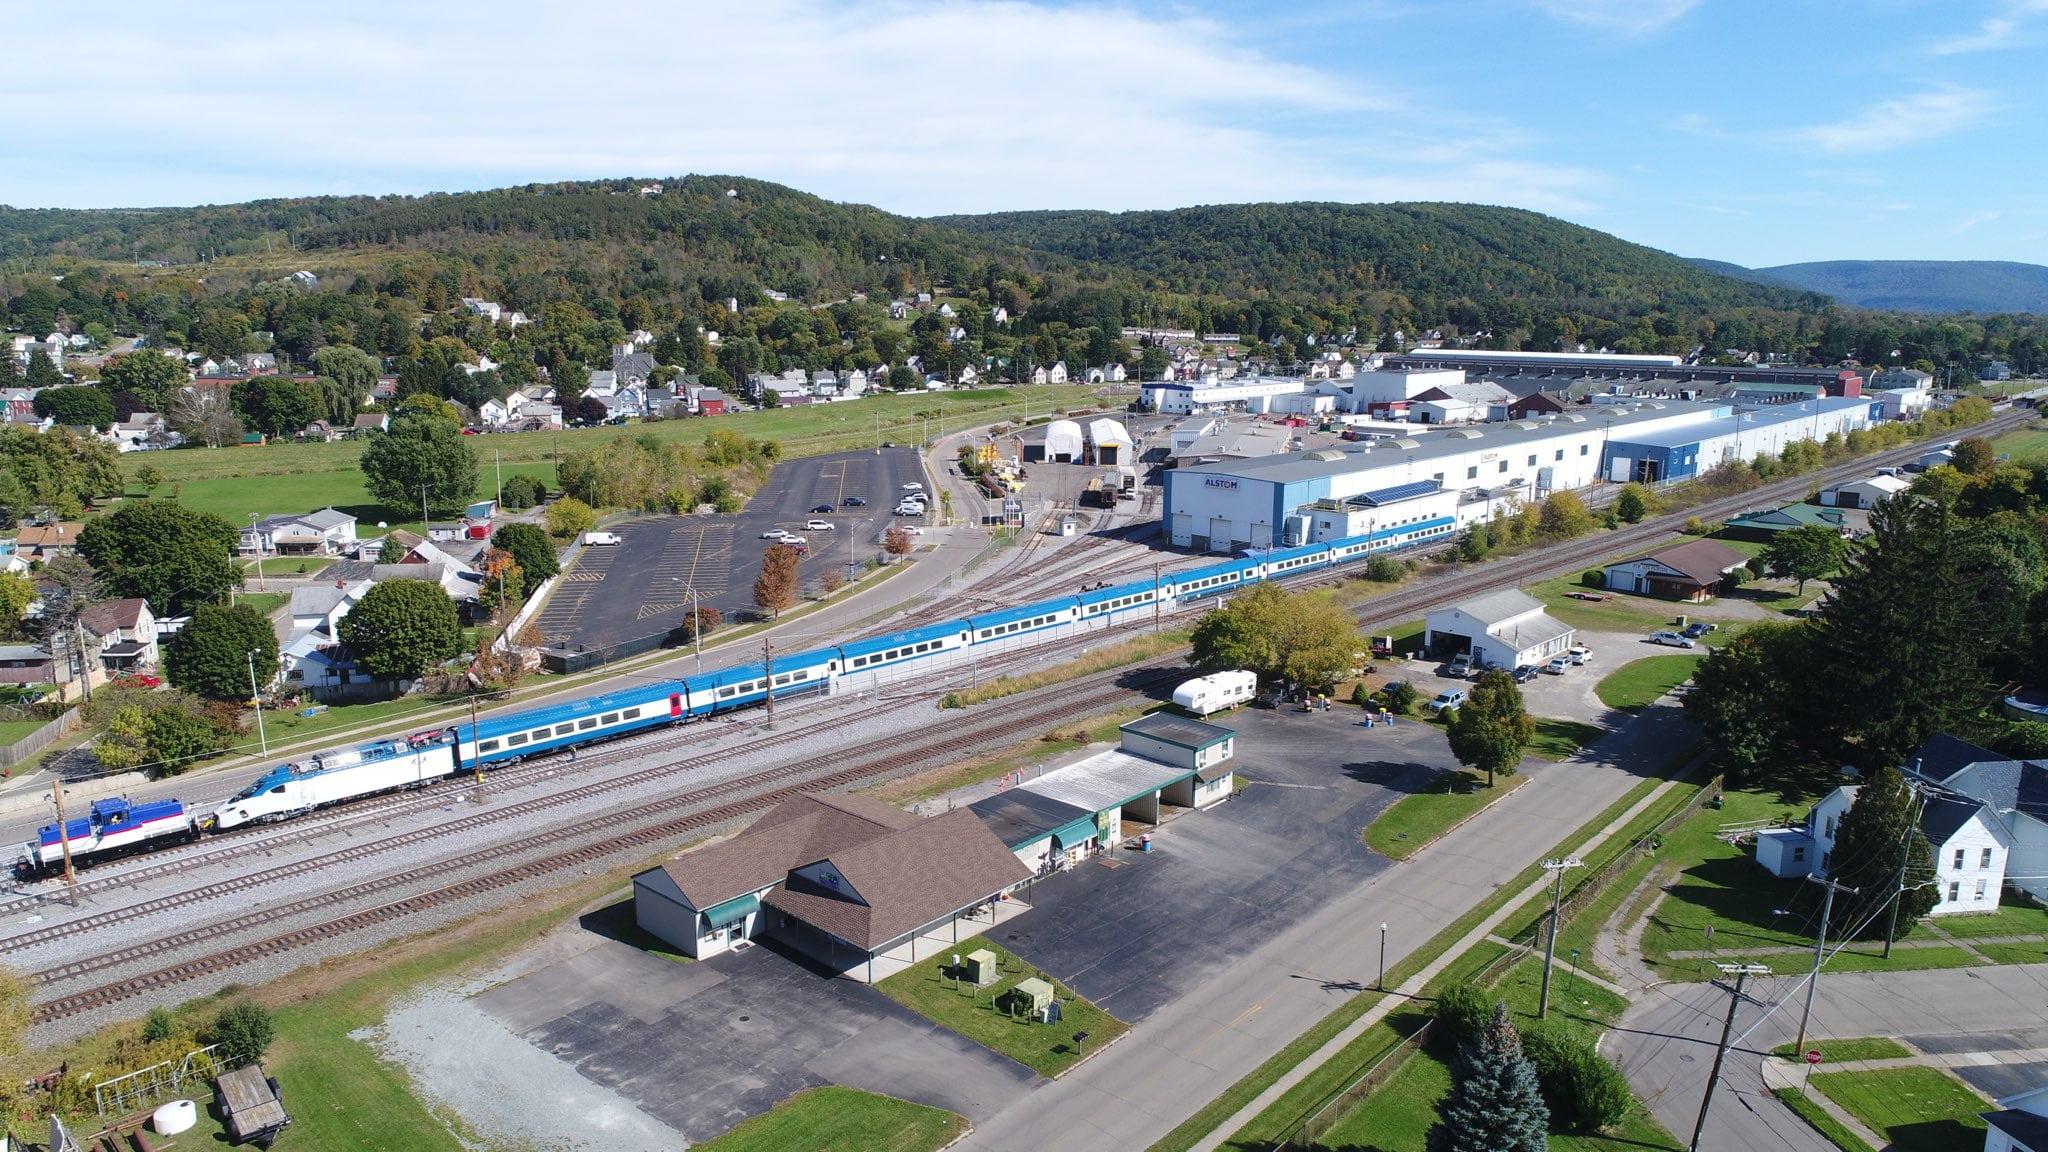 Amtrak Acela Trains at Alstom